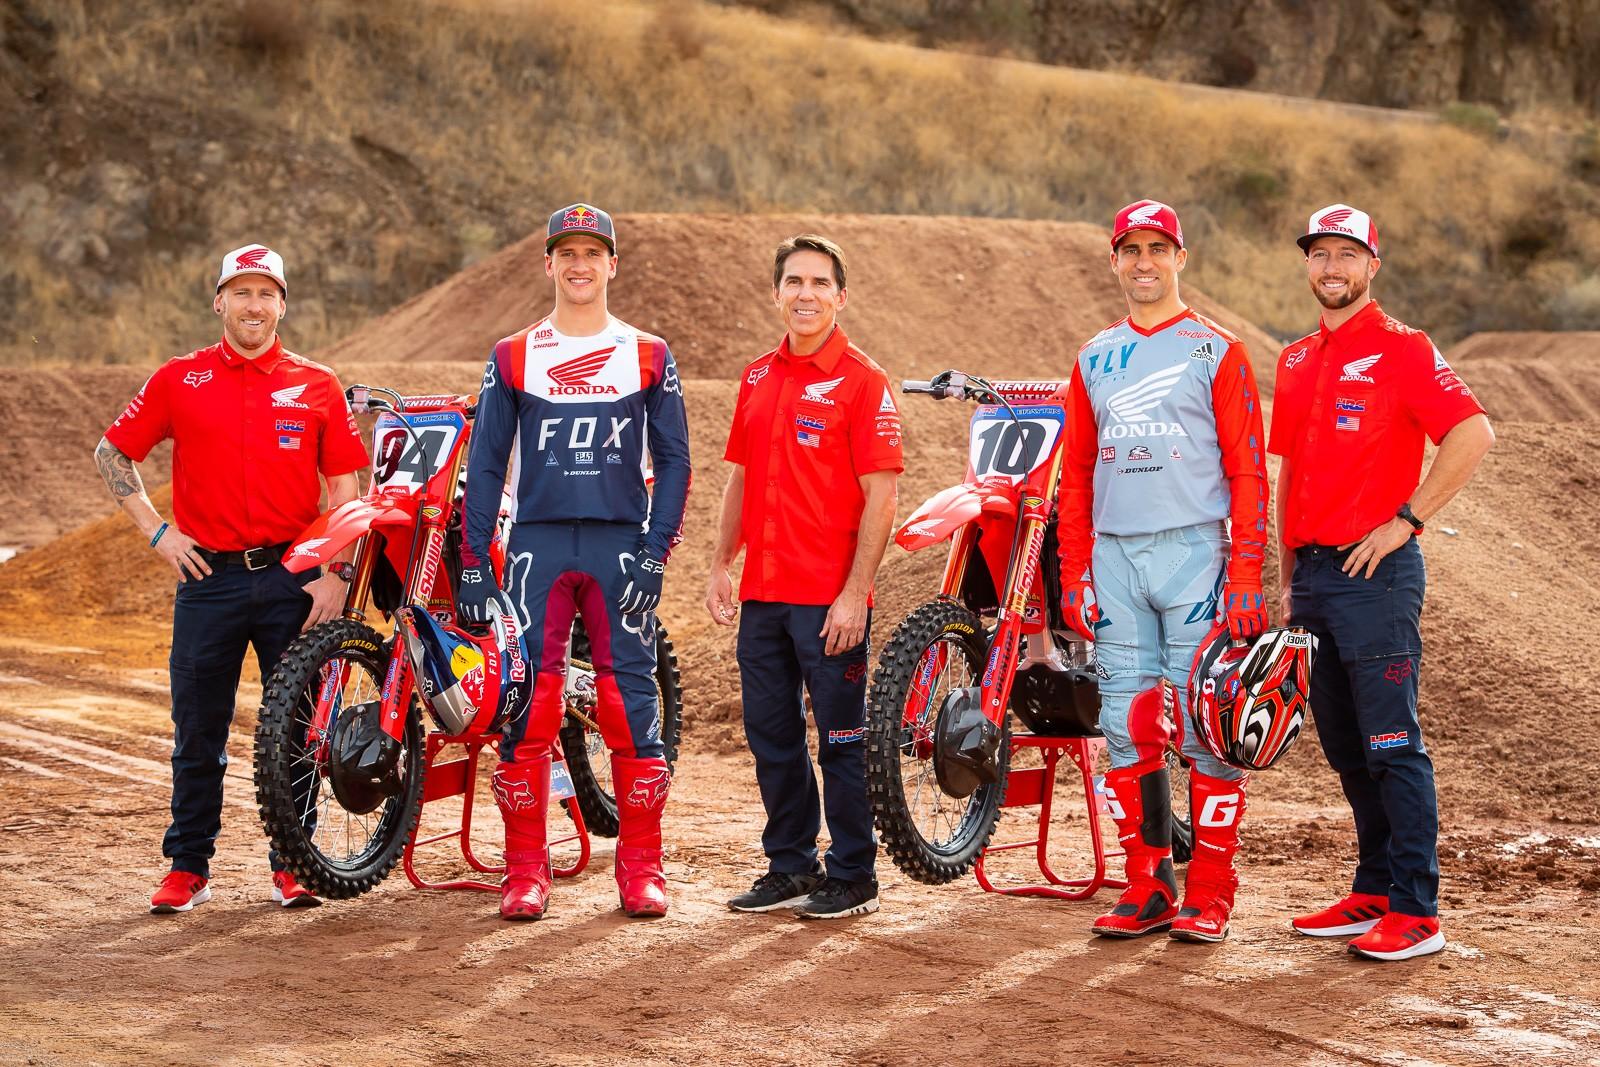 Team Honda HRC 2020 - Team Honda HRC 2020 - Motocross Pictures - Vital MX